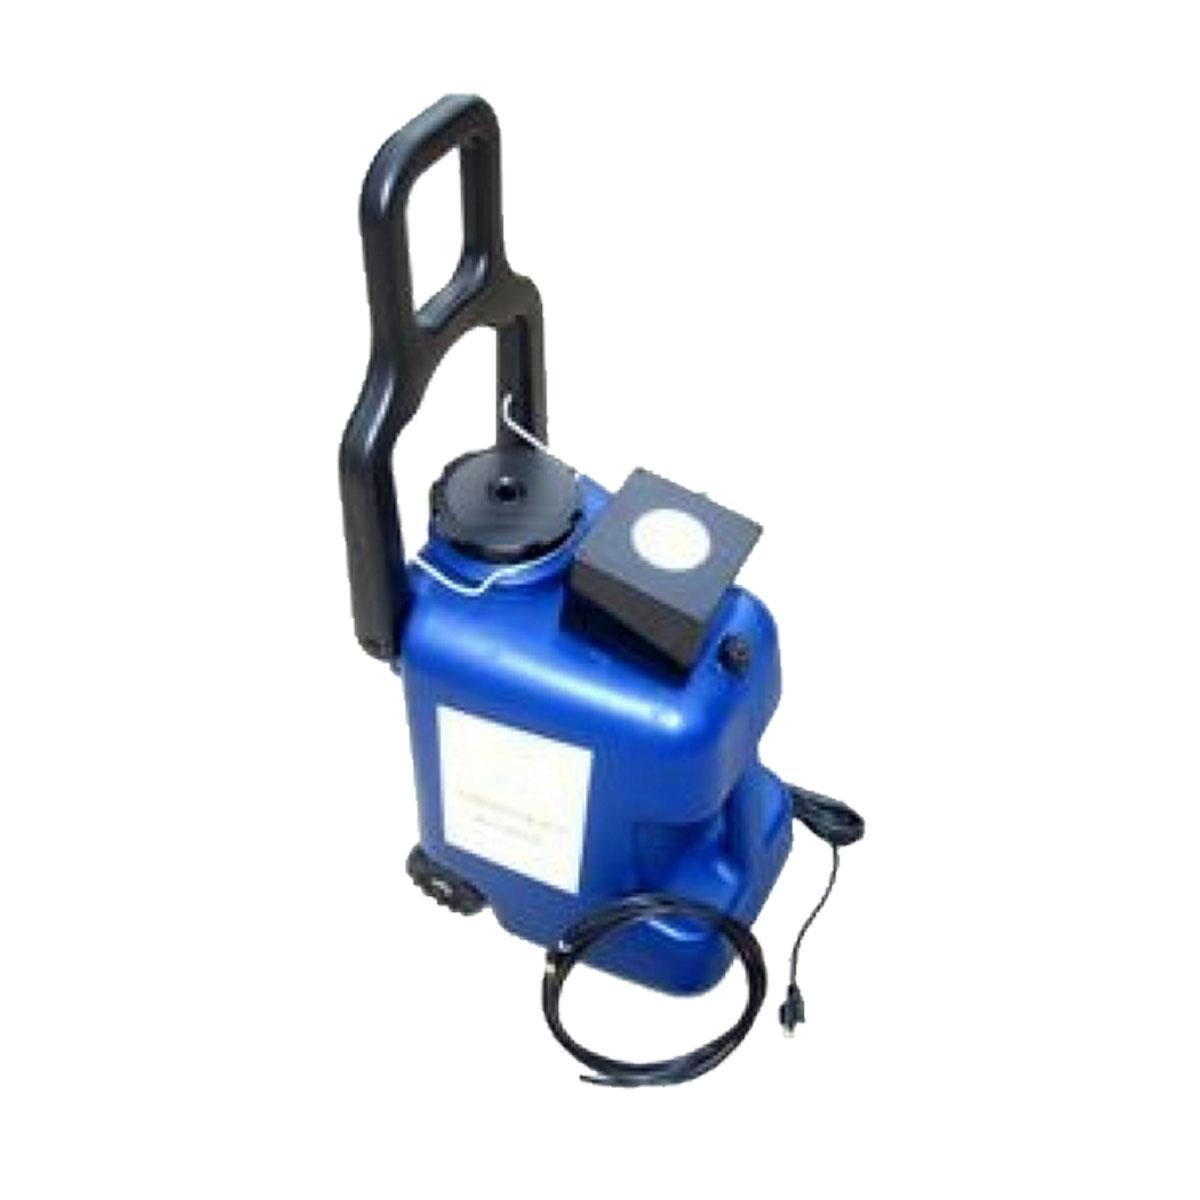 Portable Misting System 110 V